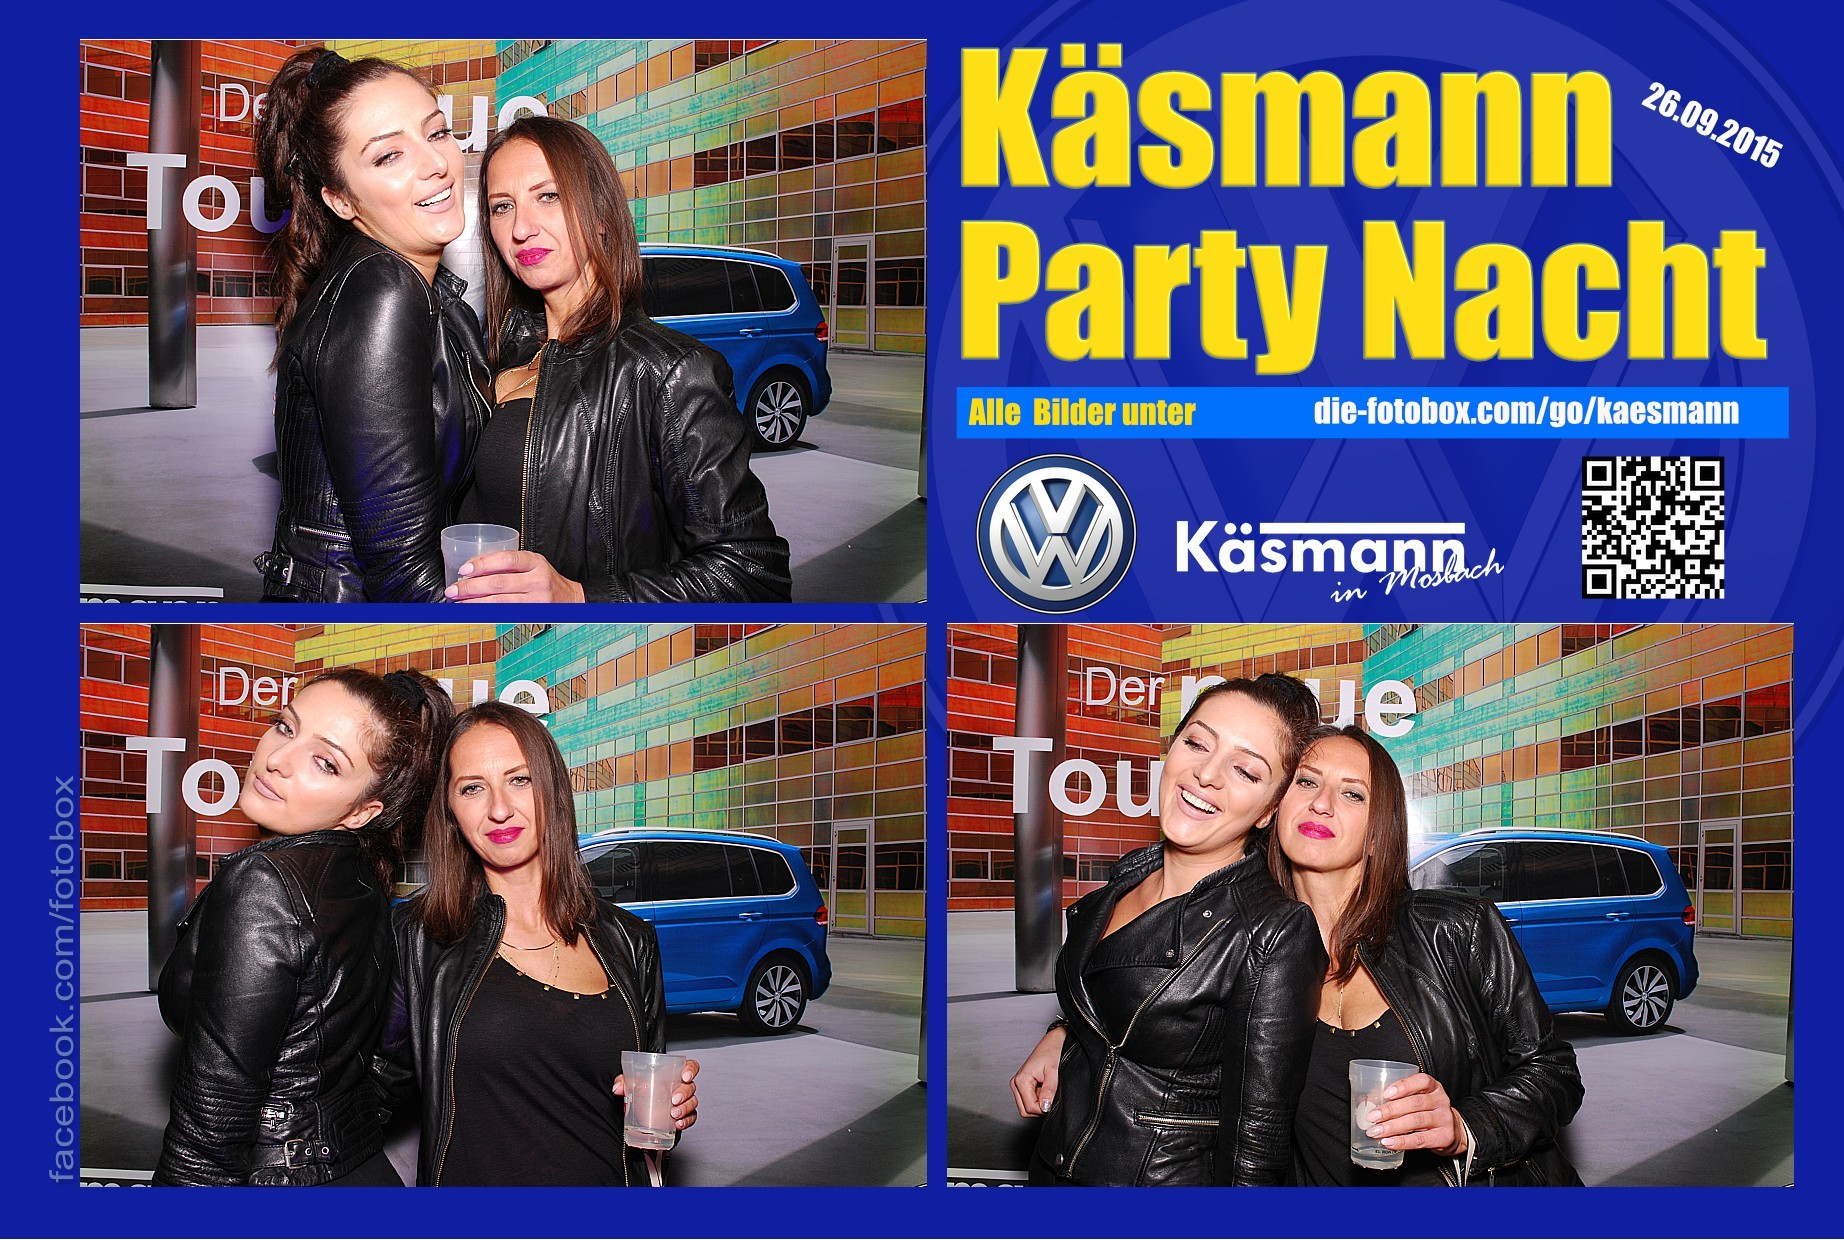 Käsmannparty 2015 - www.die-fotobox.com 01084